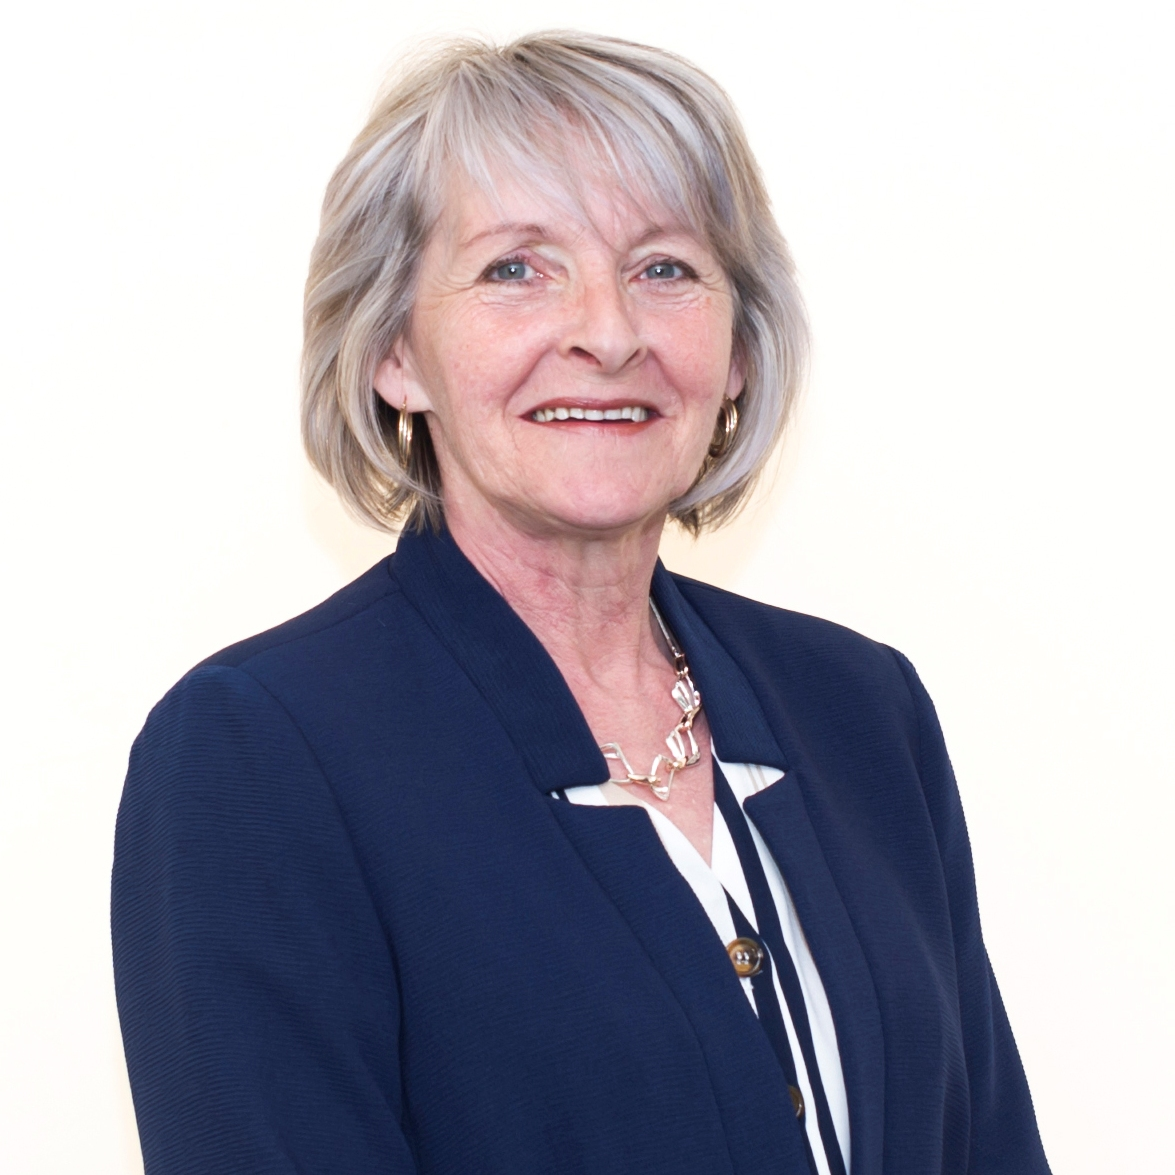 Gina Hardie